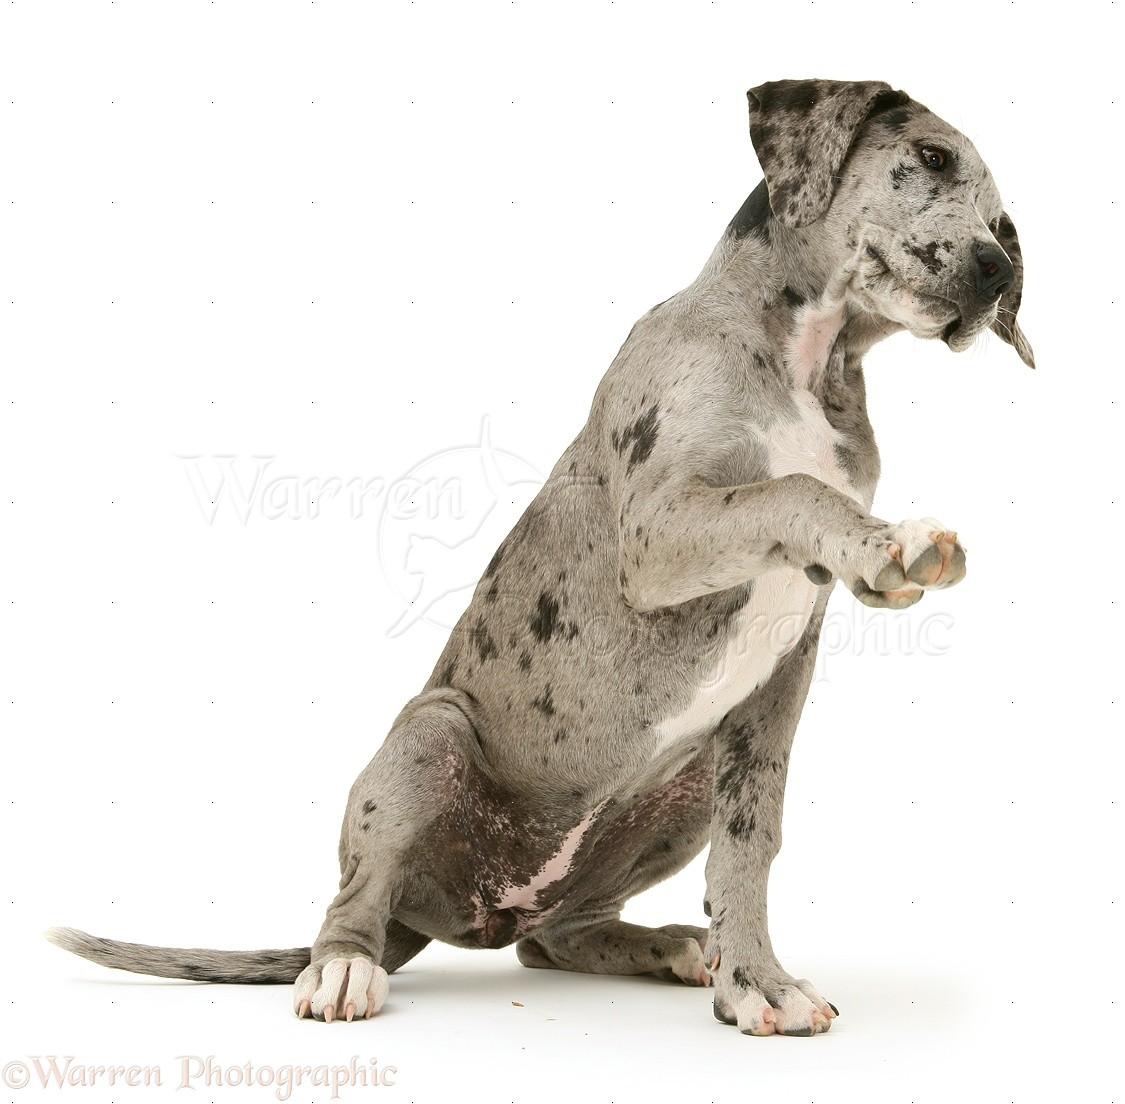 Dog Great Dane Pup Photo Wp34623